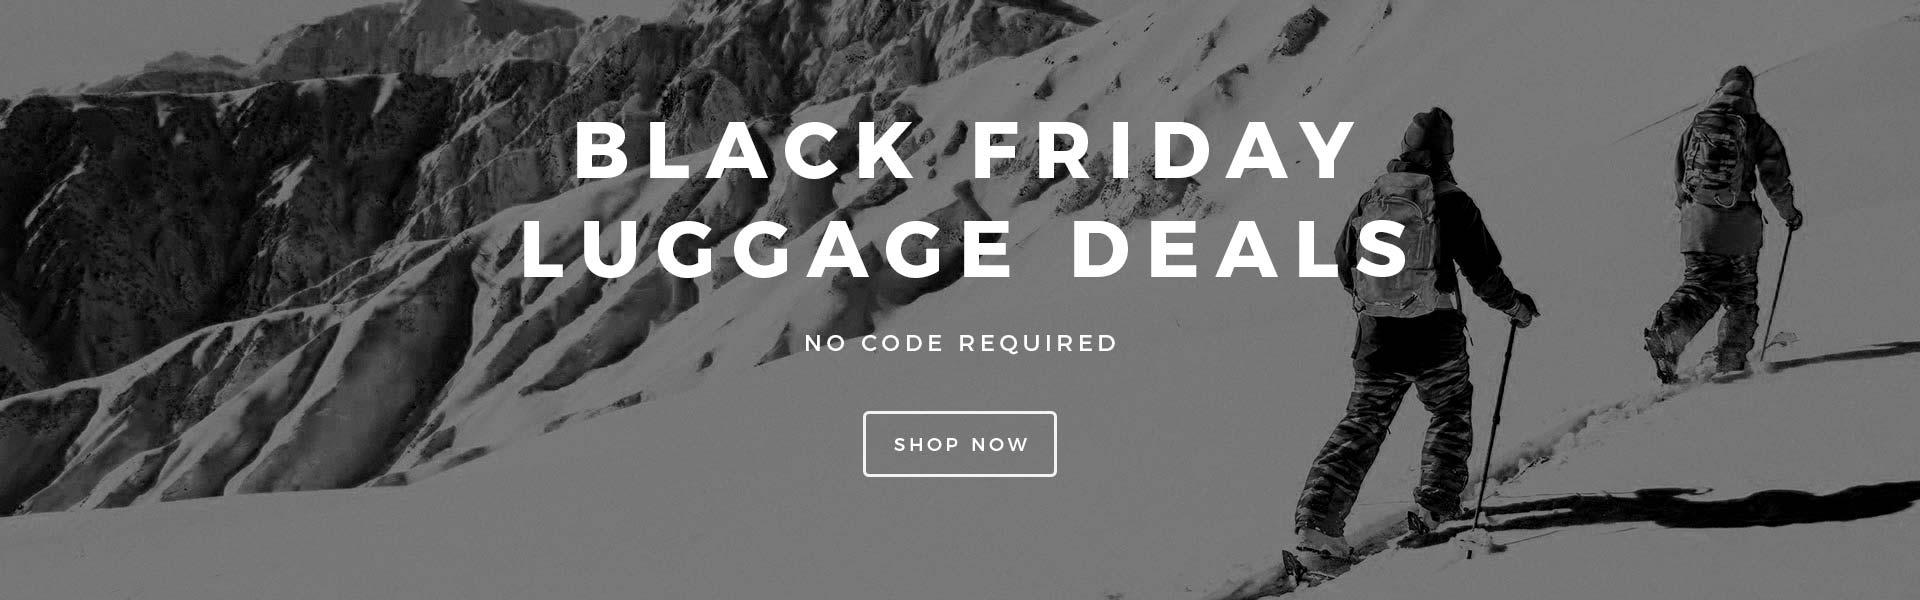 Black Friday Luggage Deals